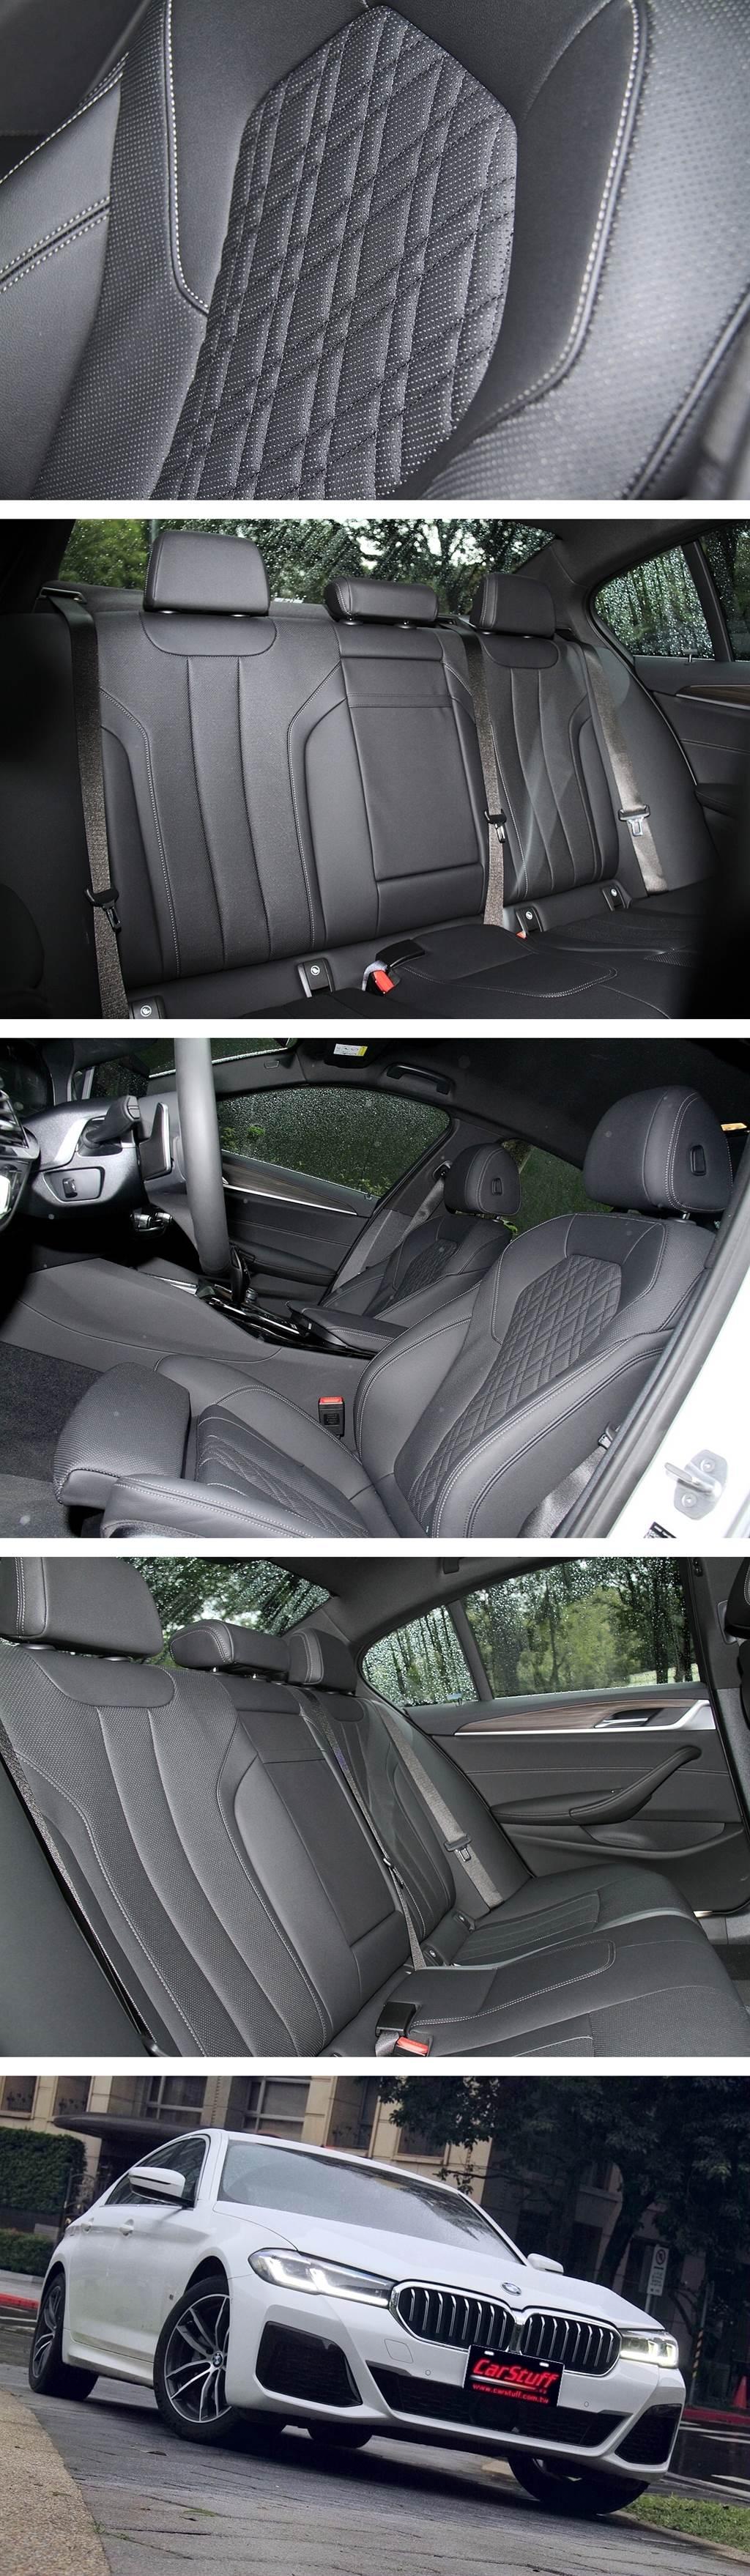 520i M Sport的首發版,贈送抬頭顯示器、Glare-free光形變化智慧型LED頭燈與遠光燈輔助配備,能順著行進道路的狀況自適應智能遮罩控制。框胎部分則是配置了M款18吋662 M型雙輻式Orbit Grey輕合金輪圈,同樣也是前後配:前輪8J,搭配 245/45 R18;後輪9J,搭配275/40 R18。